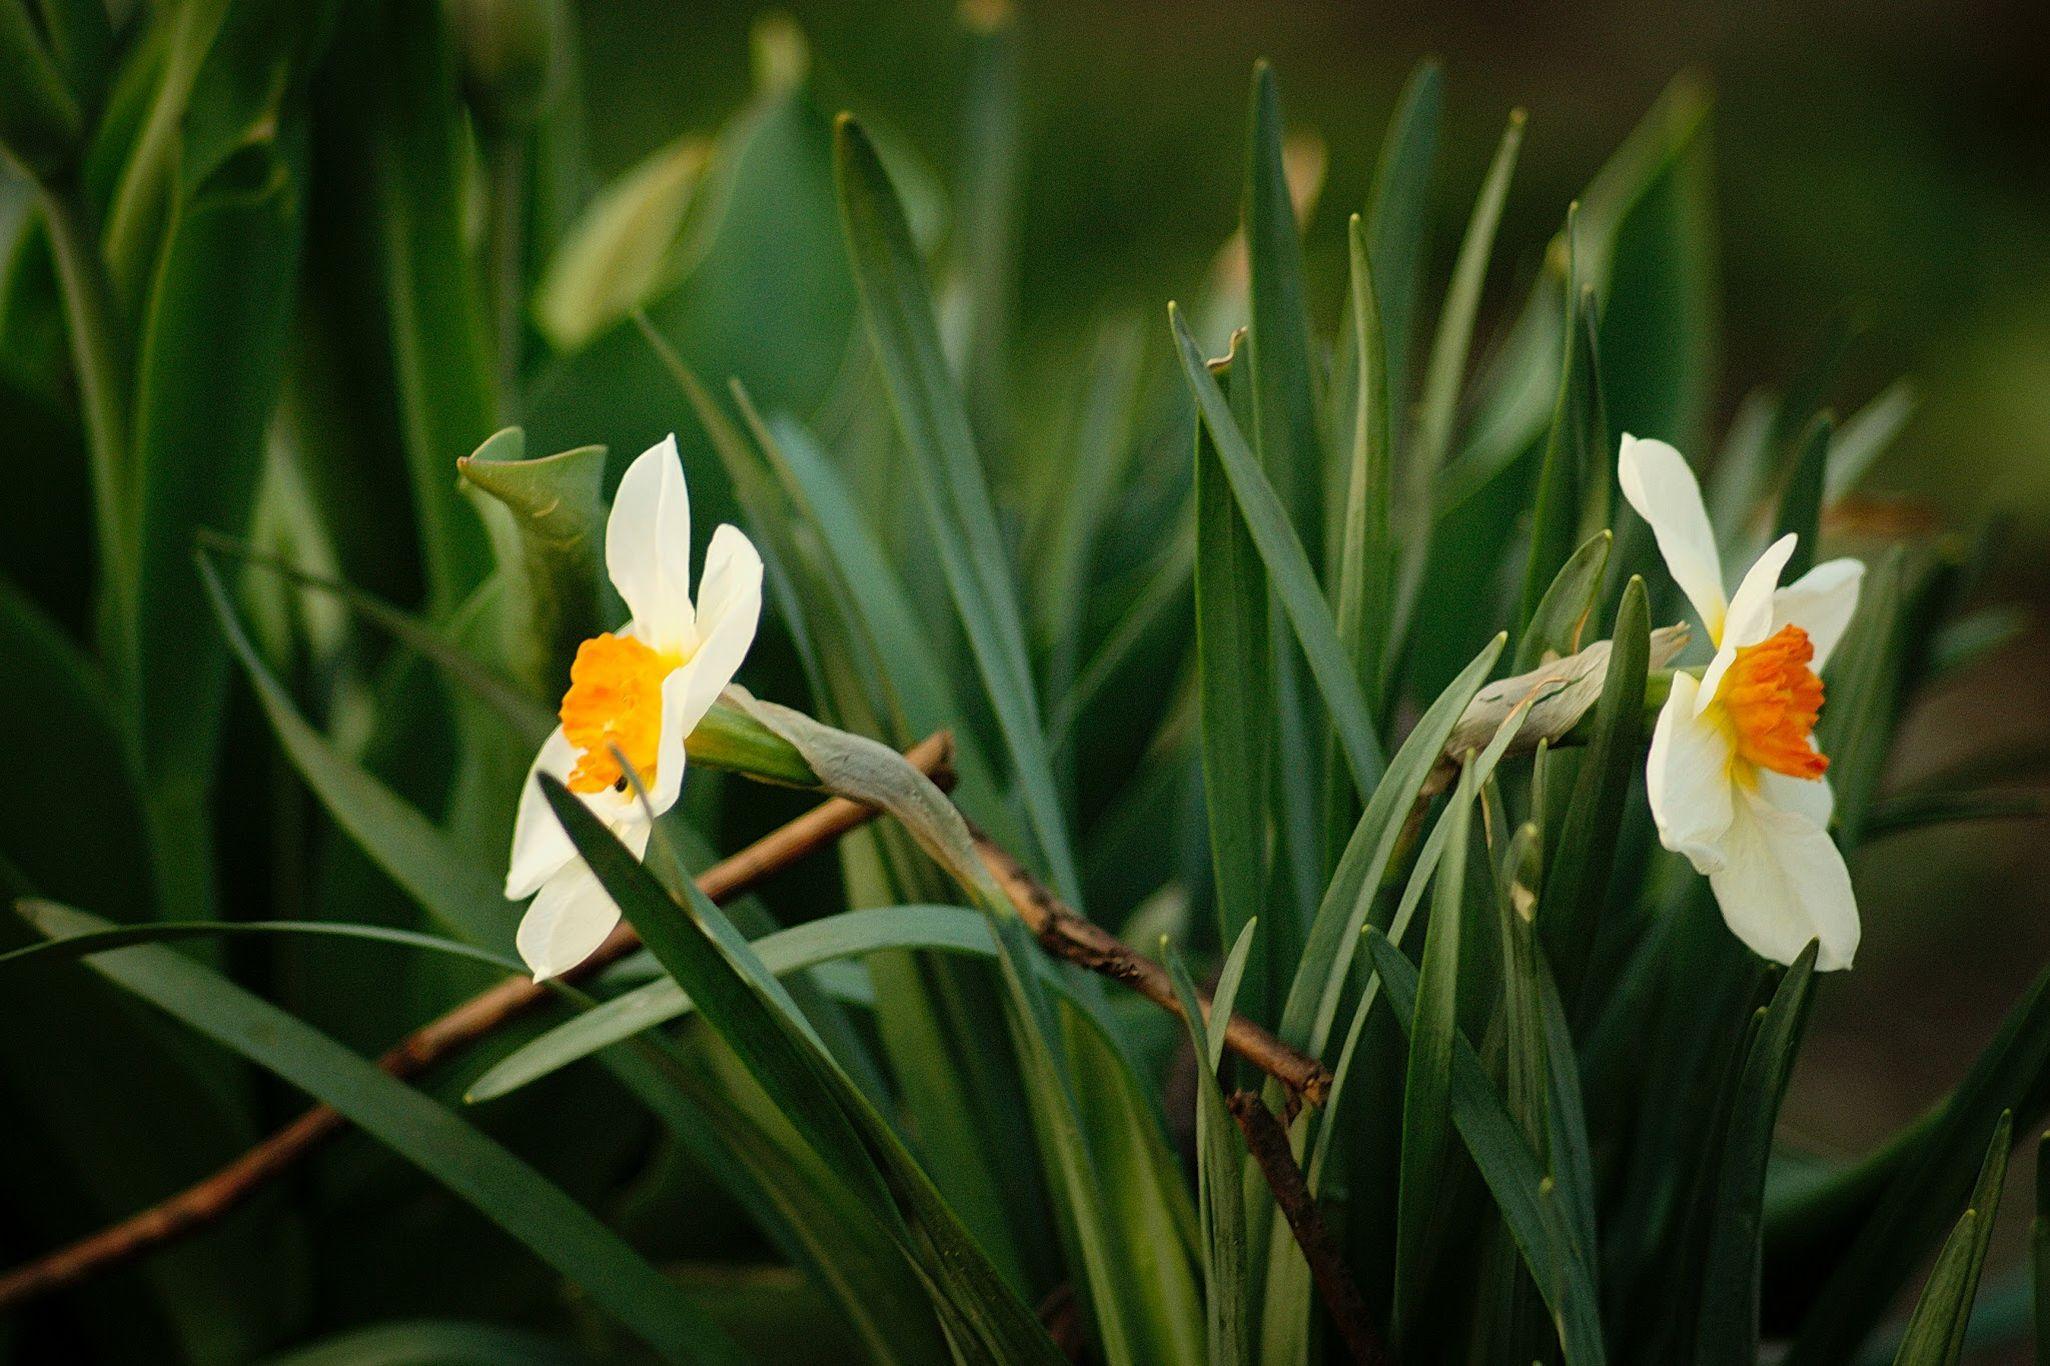 Beautiful Narsis Spring Flowers Nature Russia цветы нарциссы весна Природа